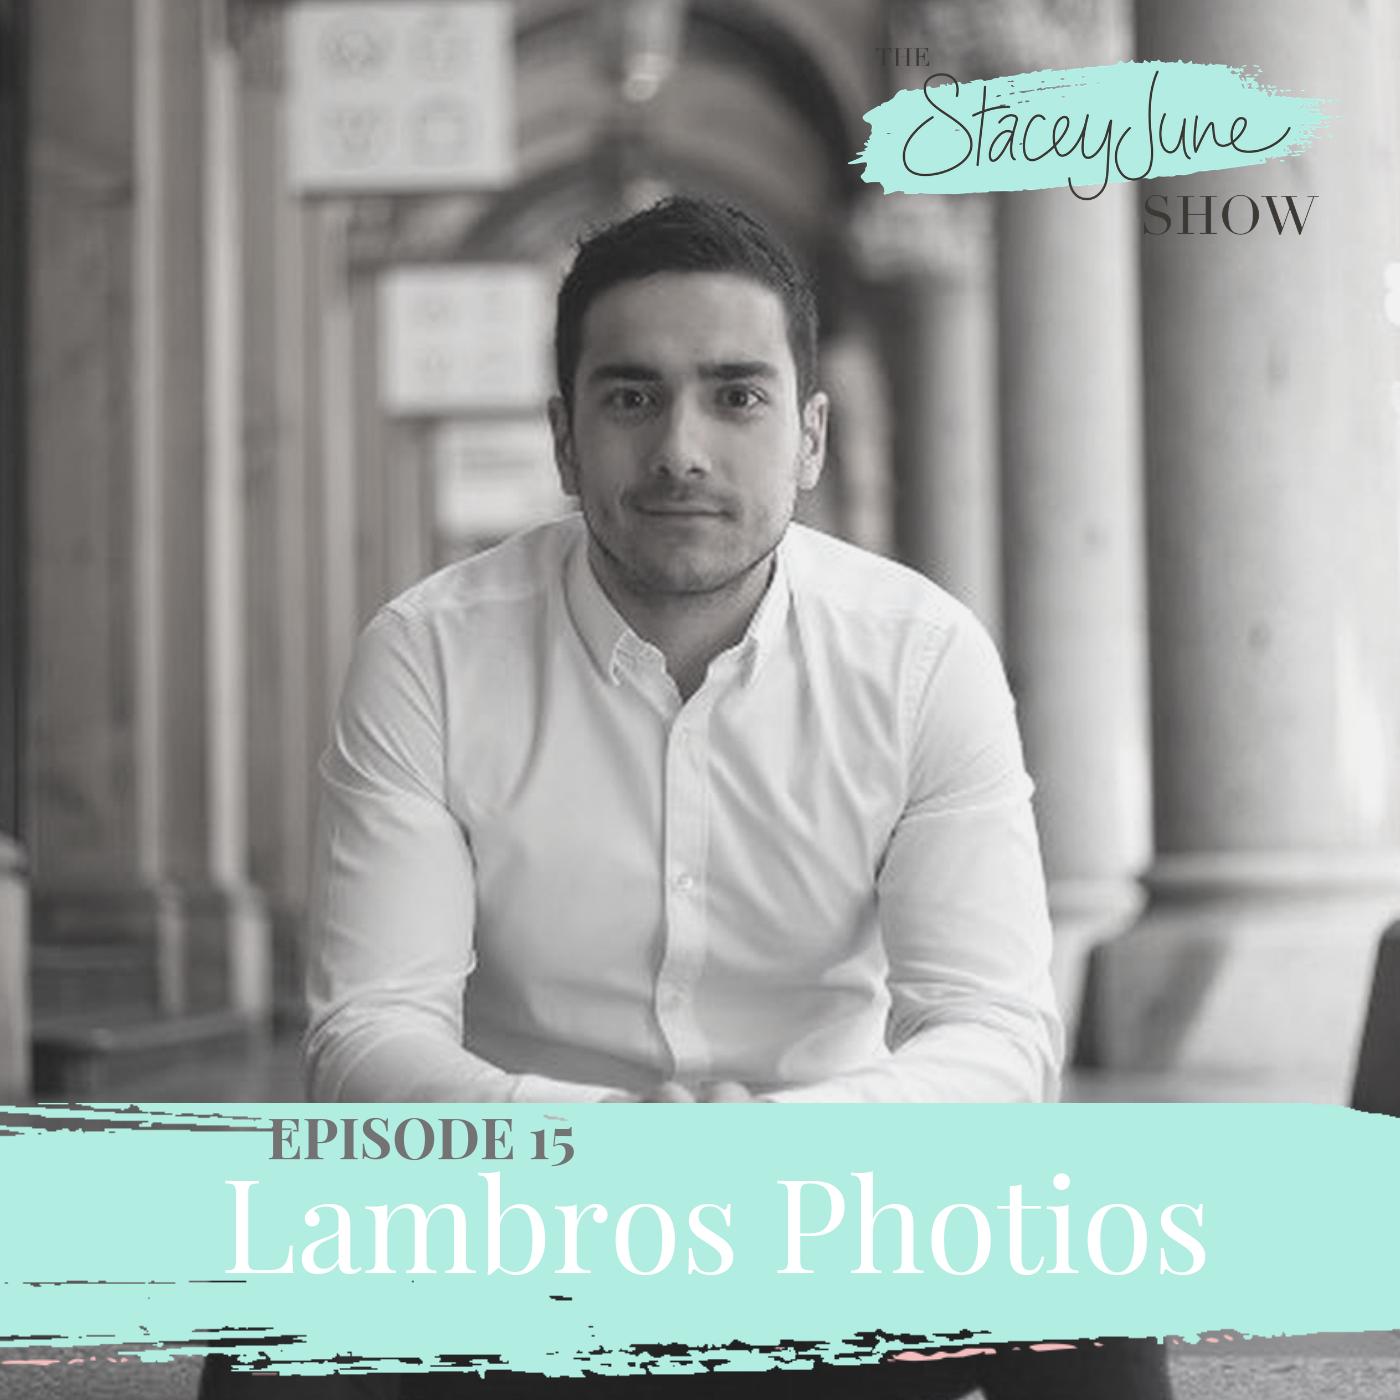 SJS_Lambros Photios tile.png